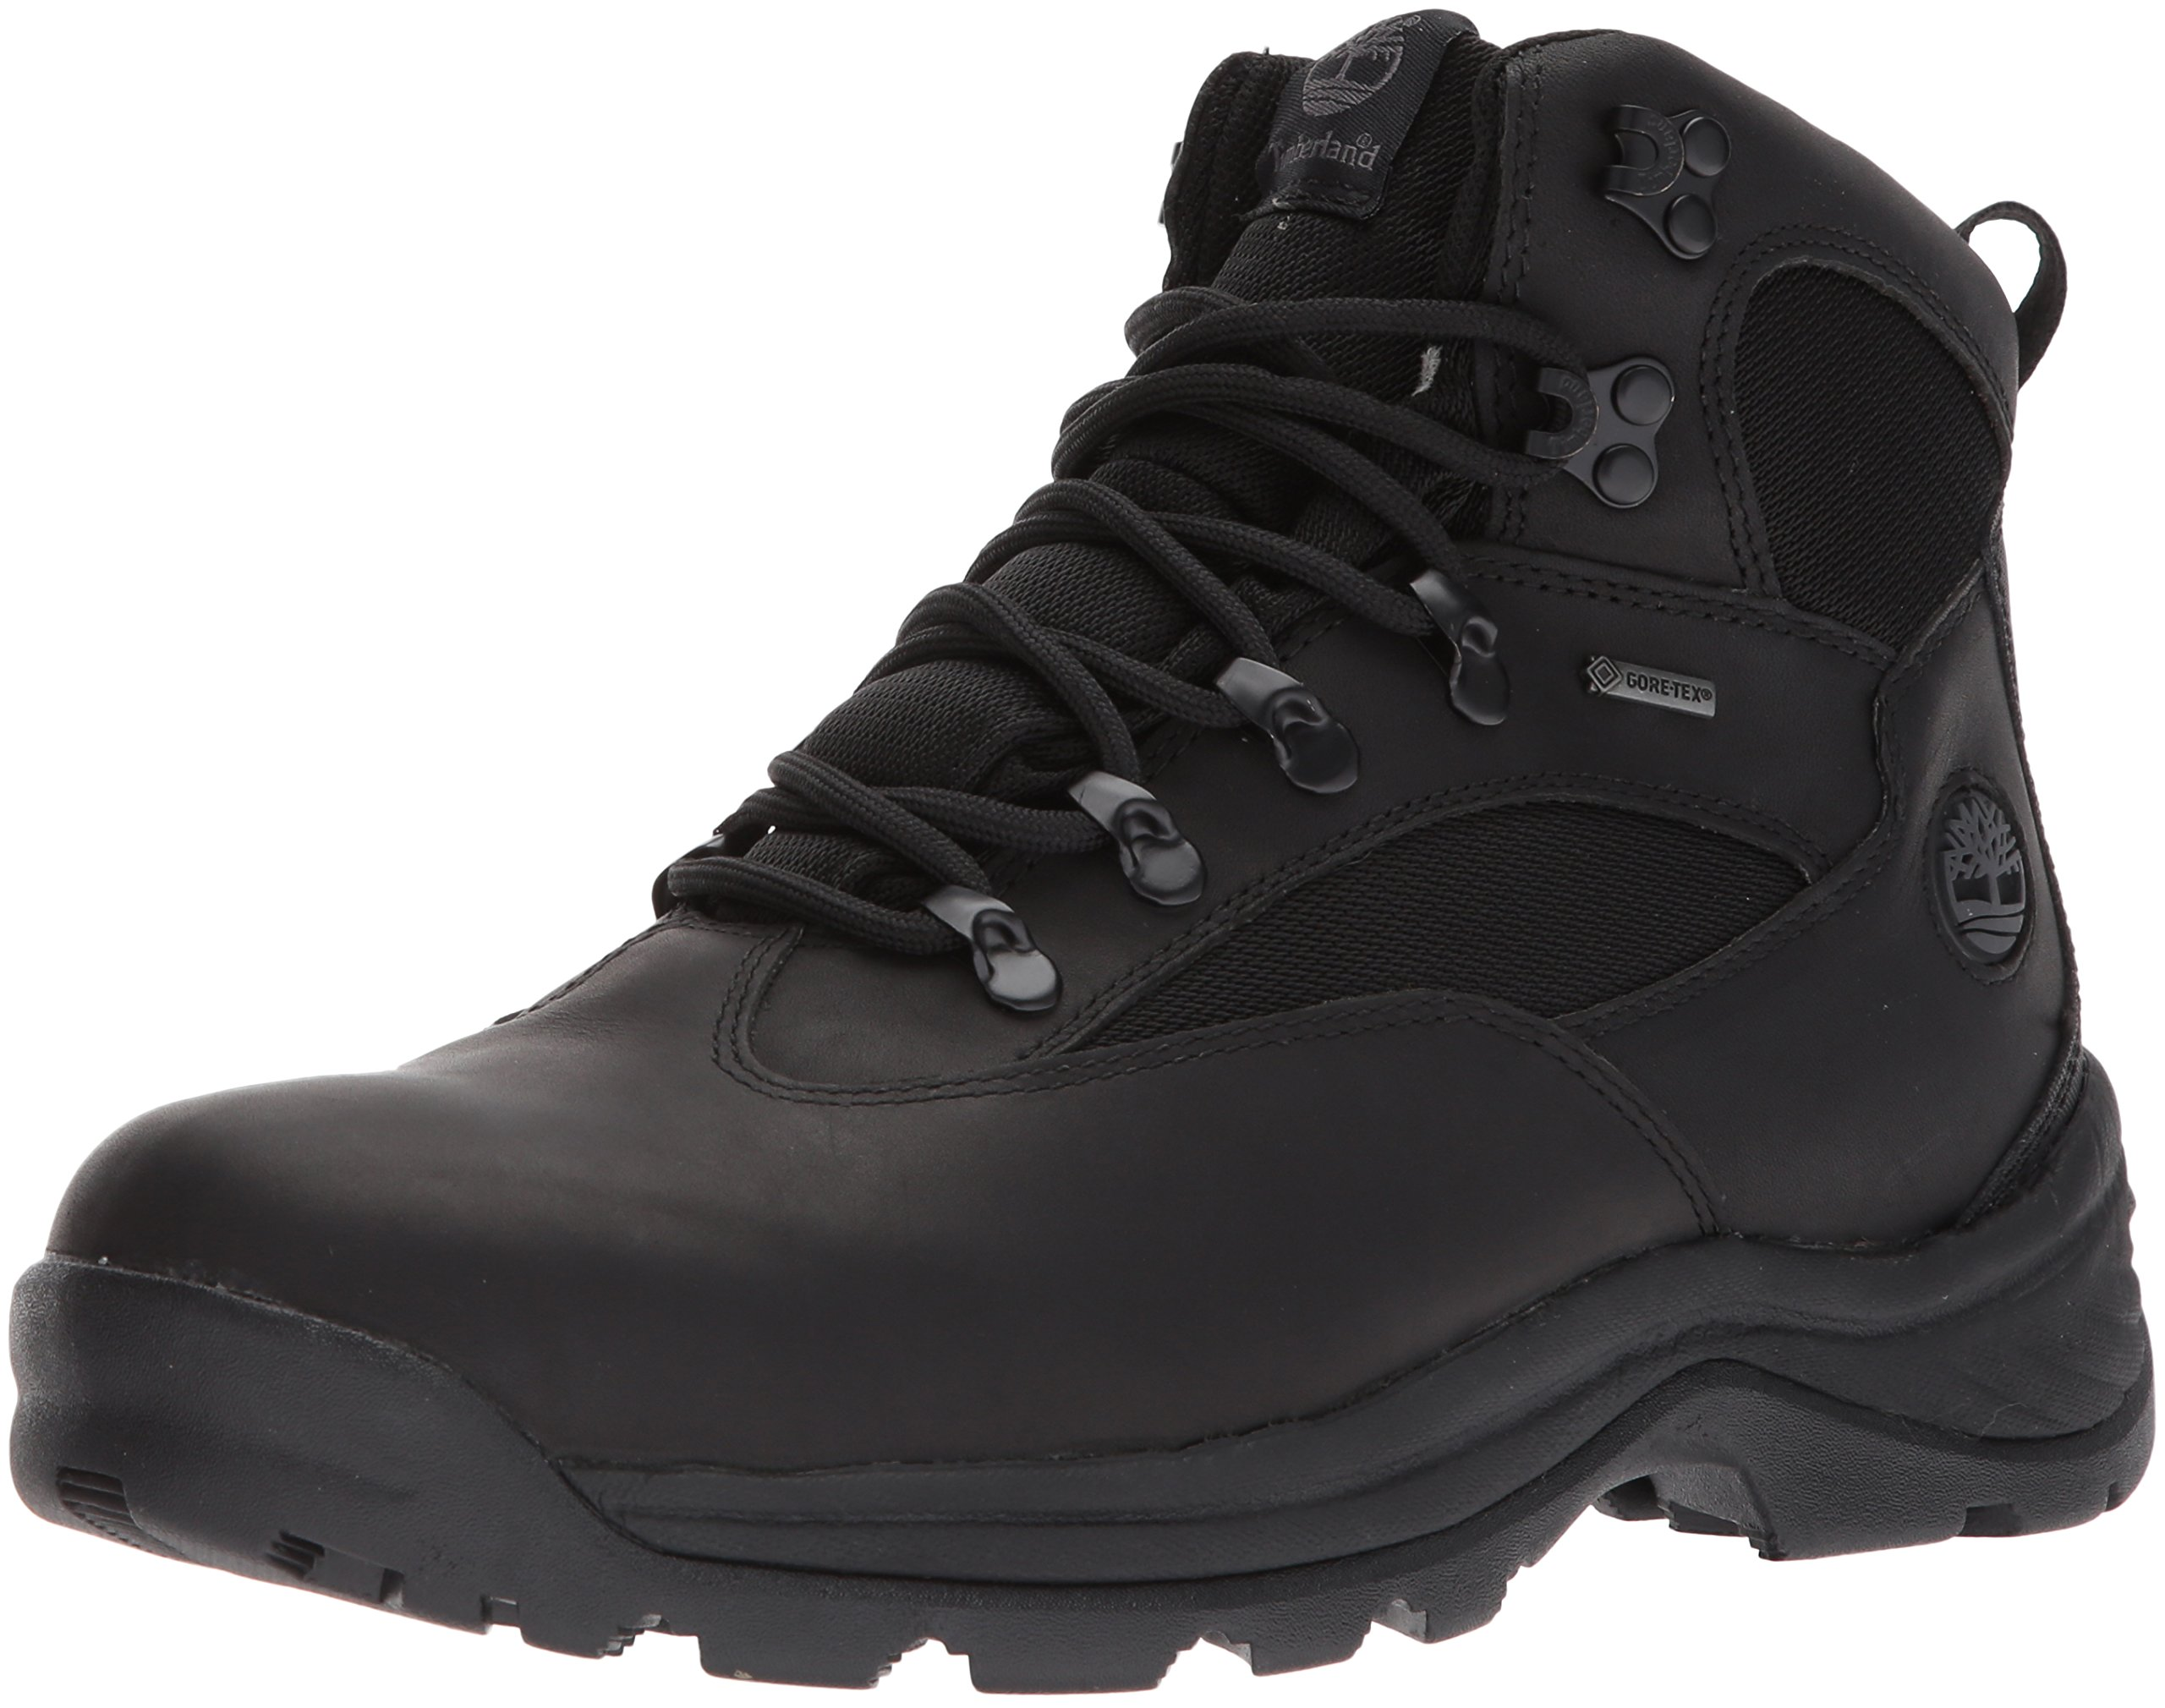 Timberland Men's Chocorua Trail Gore-Tex Mid Hiking Boot (11 D(M) US / 44 EUR, Black)